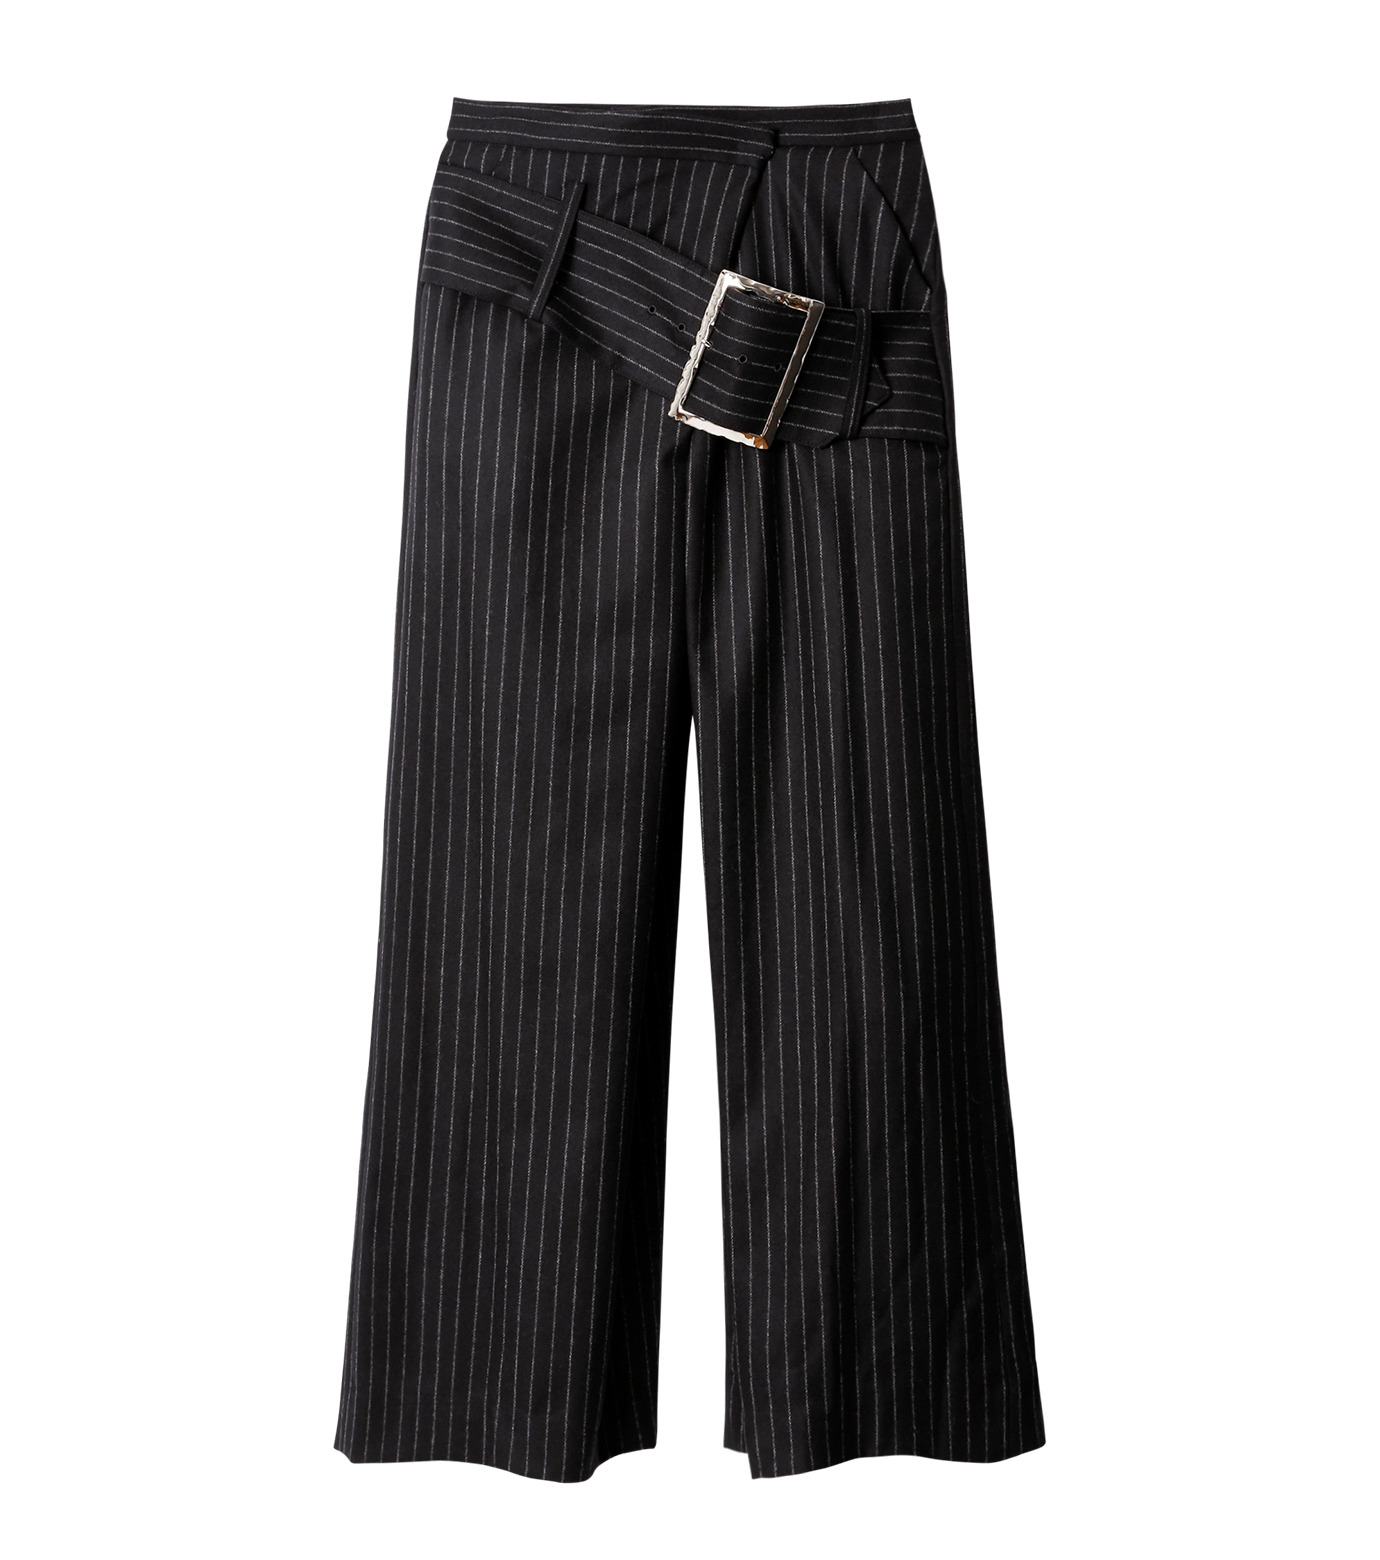 CHRISTIAN DADA(クリスチャン ダダ)のStriped Wideleg Trouser w/Buckle-BLACK(パンツ/pants)-16W-D-0607-13 拡大詳細画像4